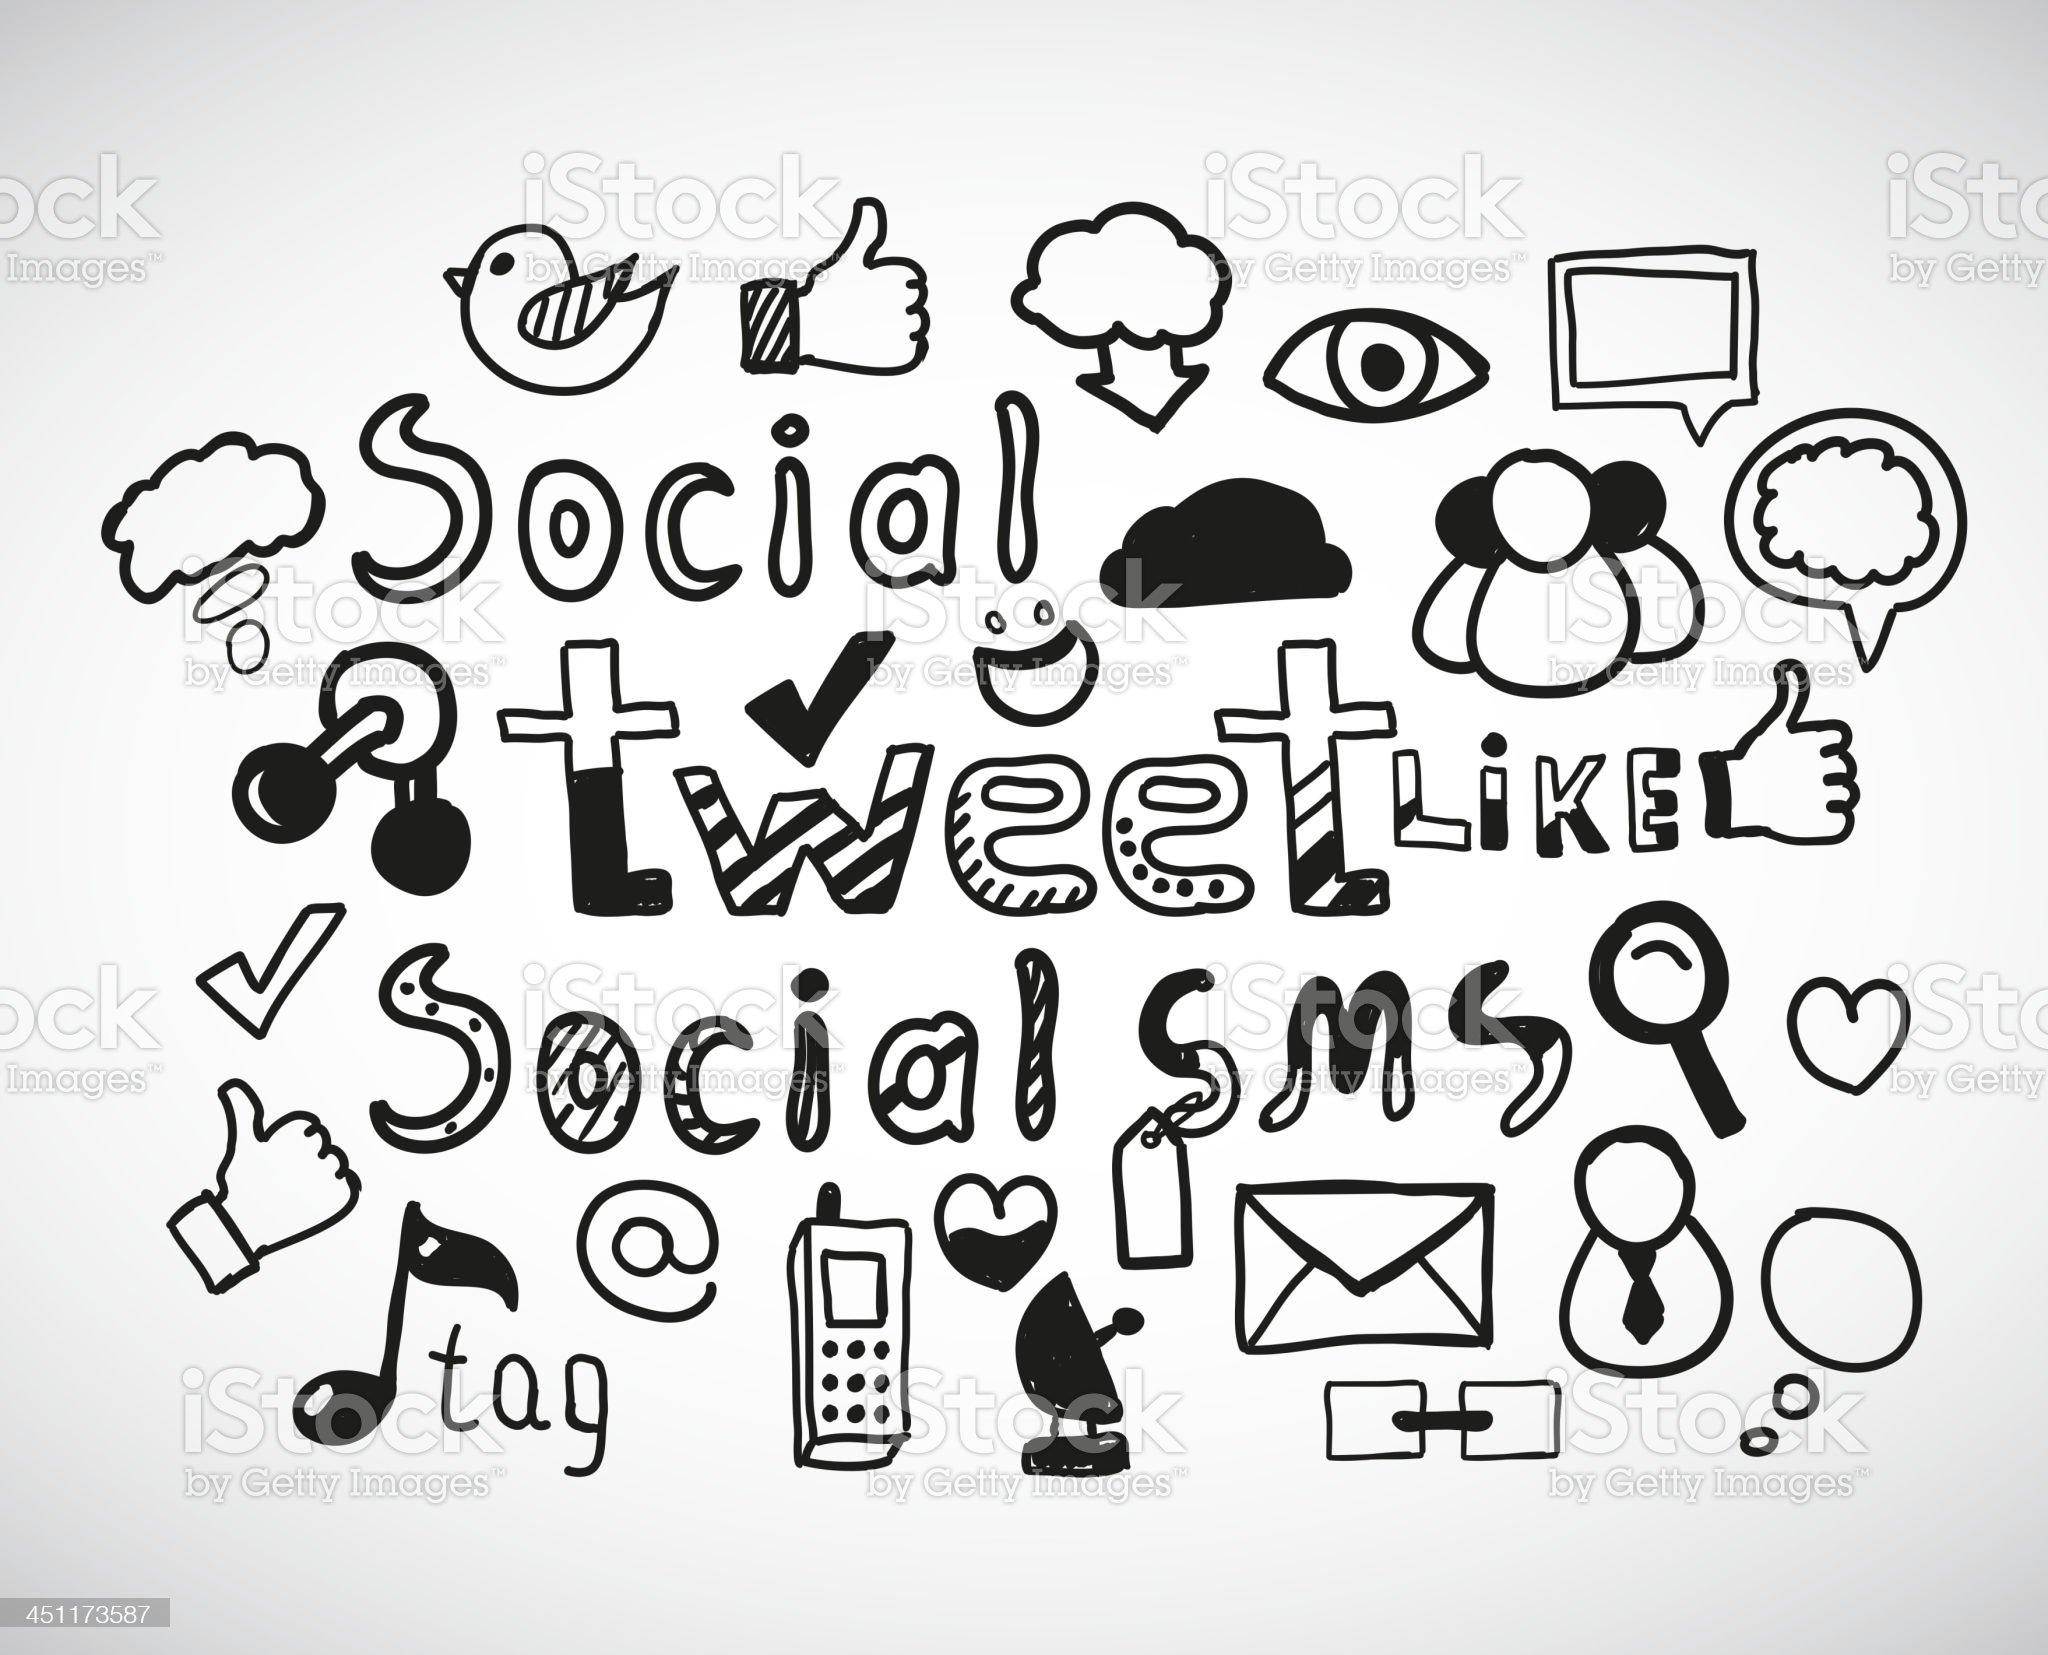 Vector social network doodles royalty-free stock vector art